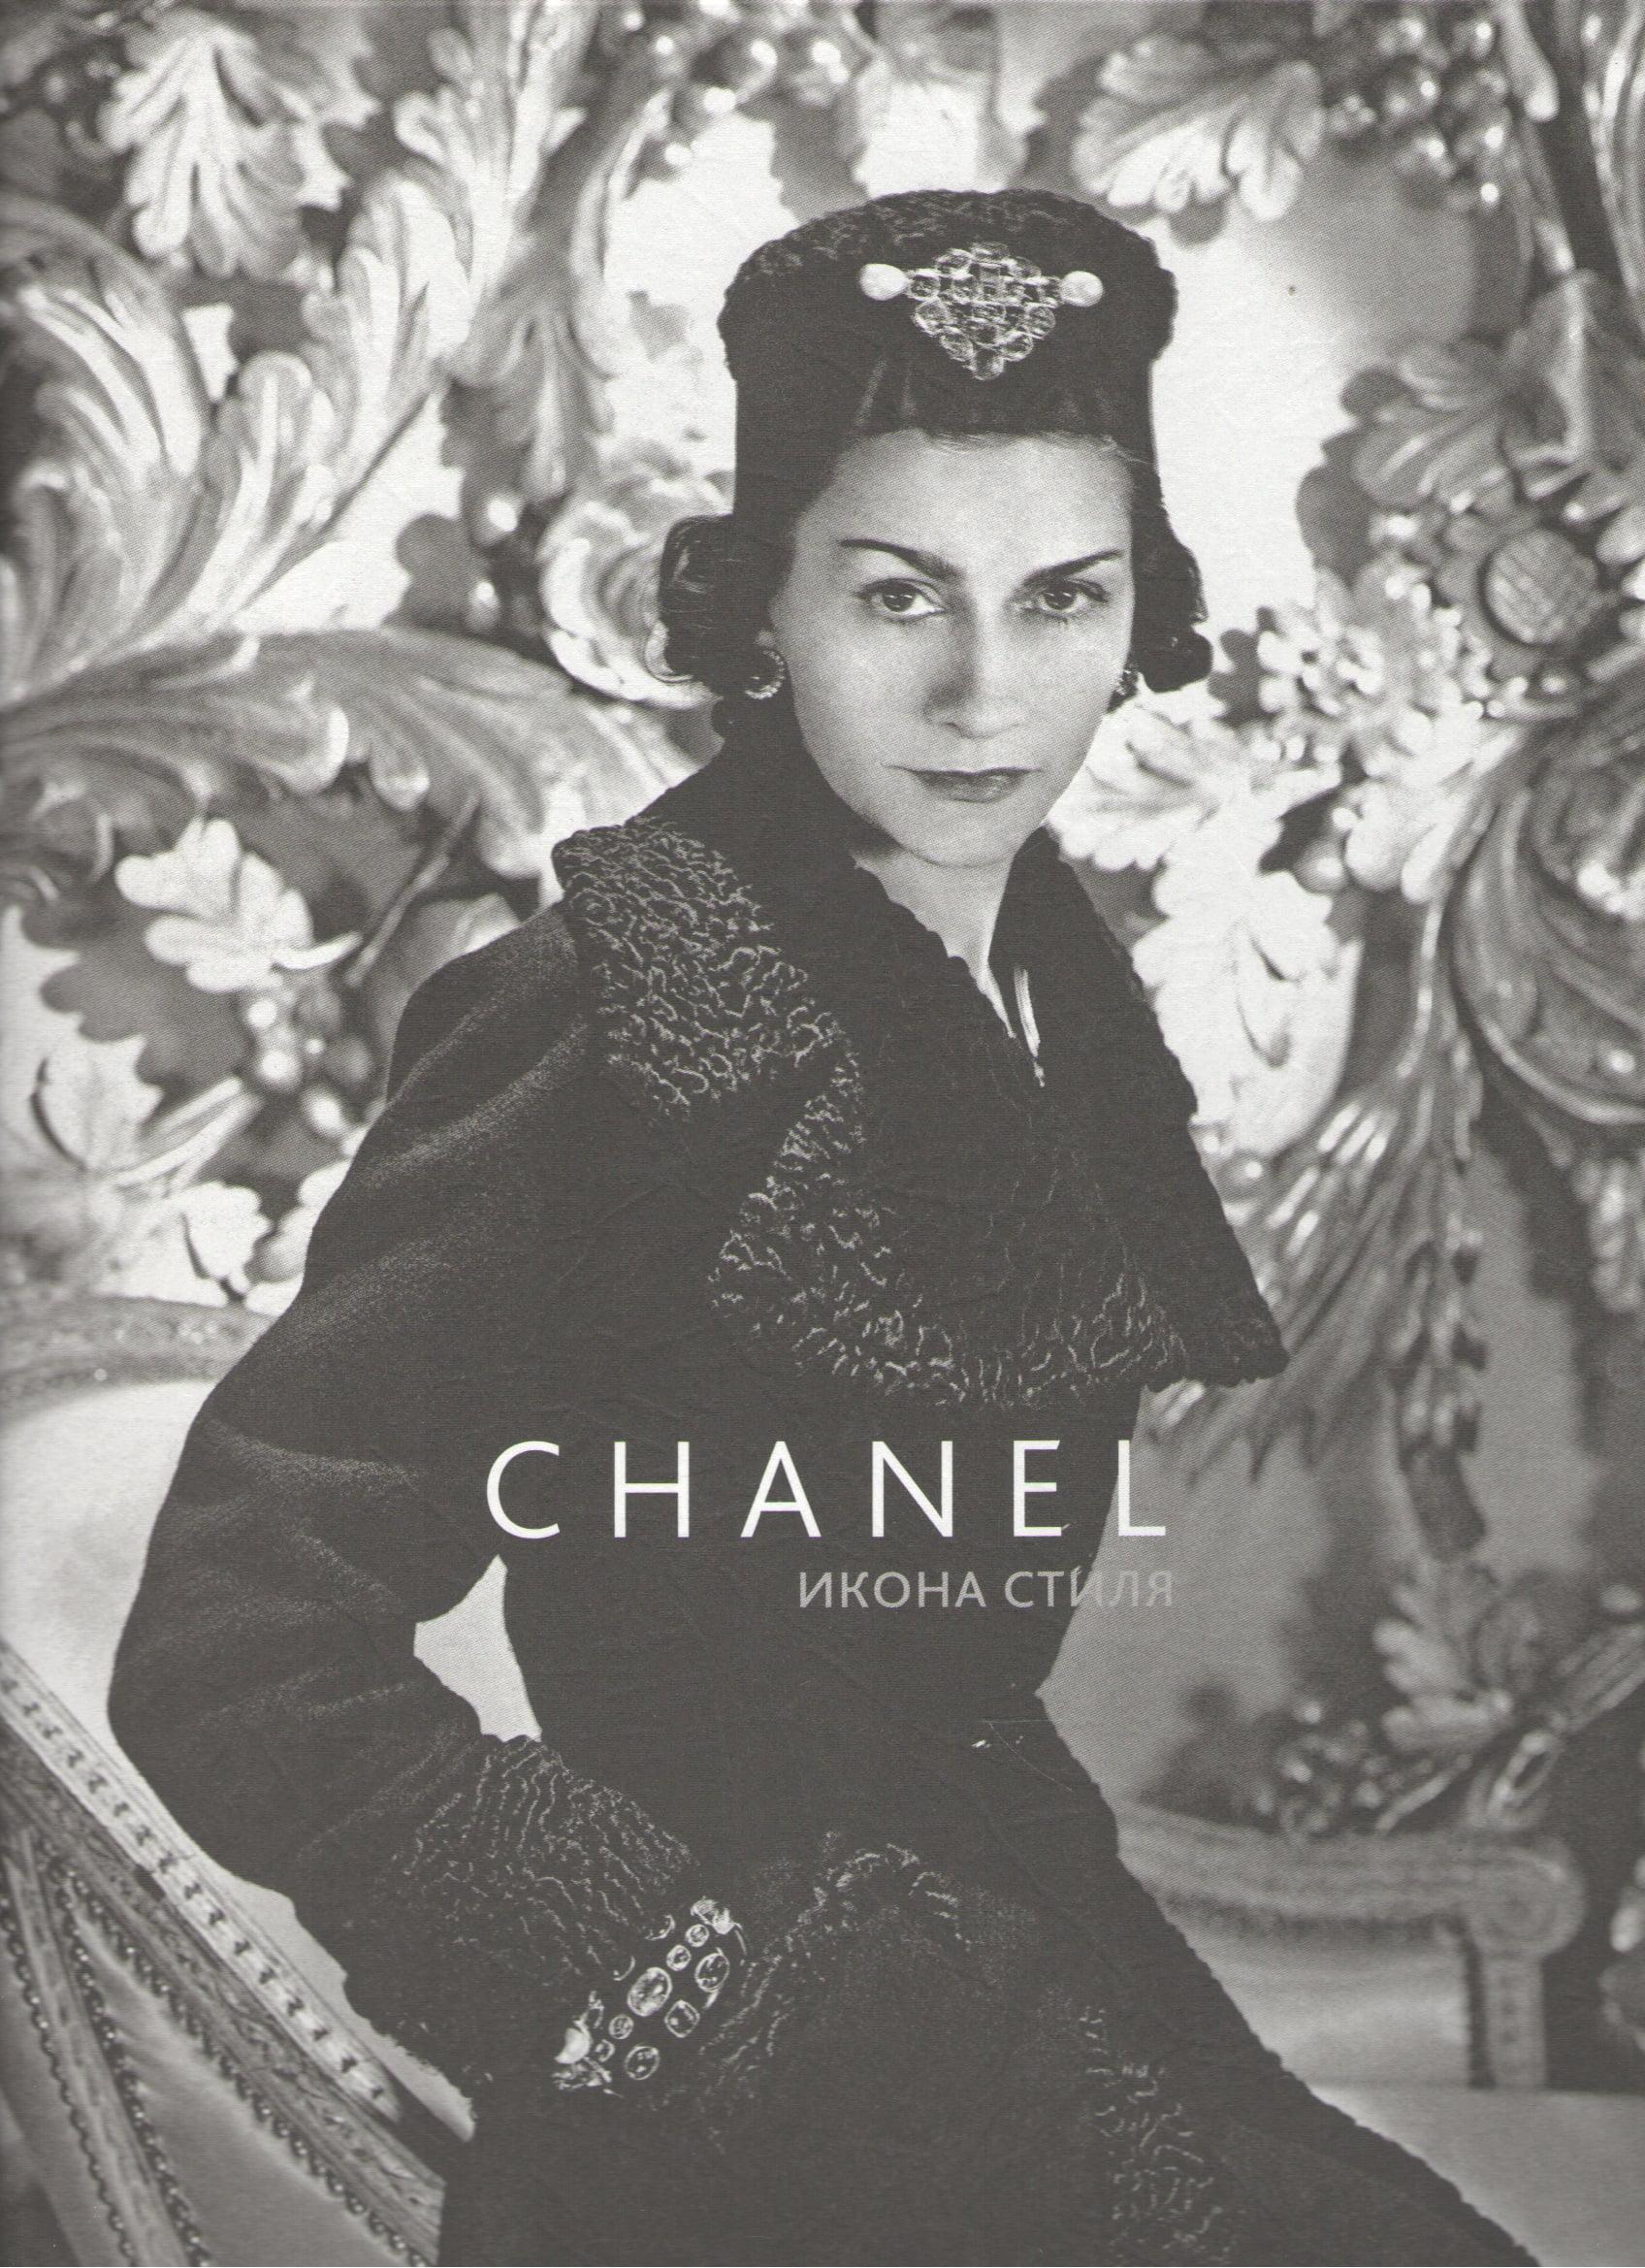 Chanel.+%D0%98%D0%BA%D0%BE%D0%BD%D0%B0+%D1%81%D1%82%D0%B8%D0%BB%D1%8F - фото 1